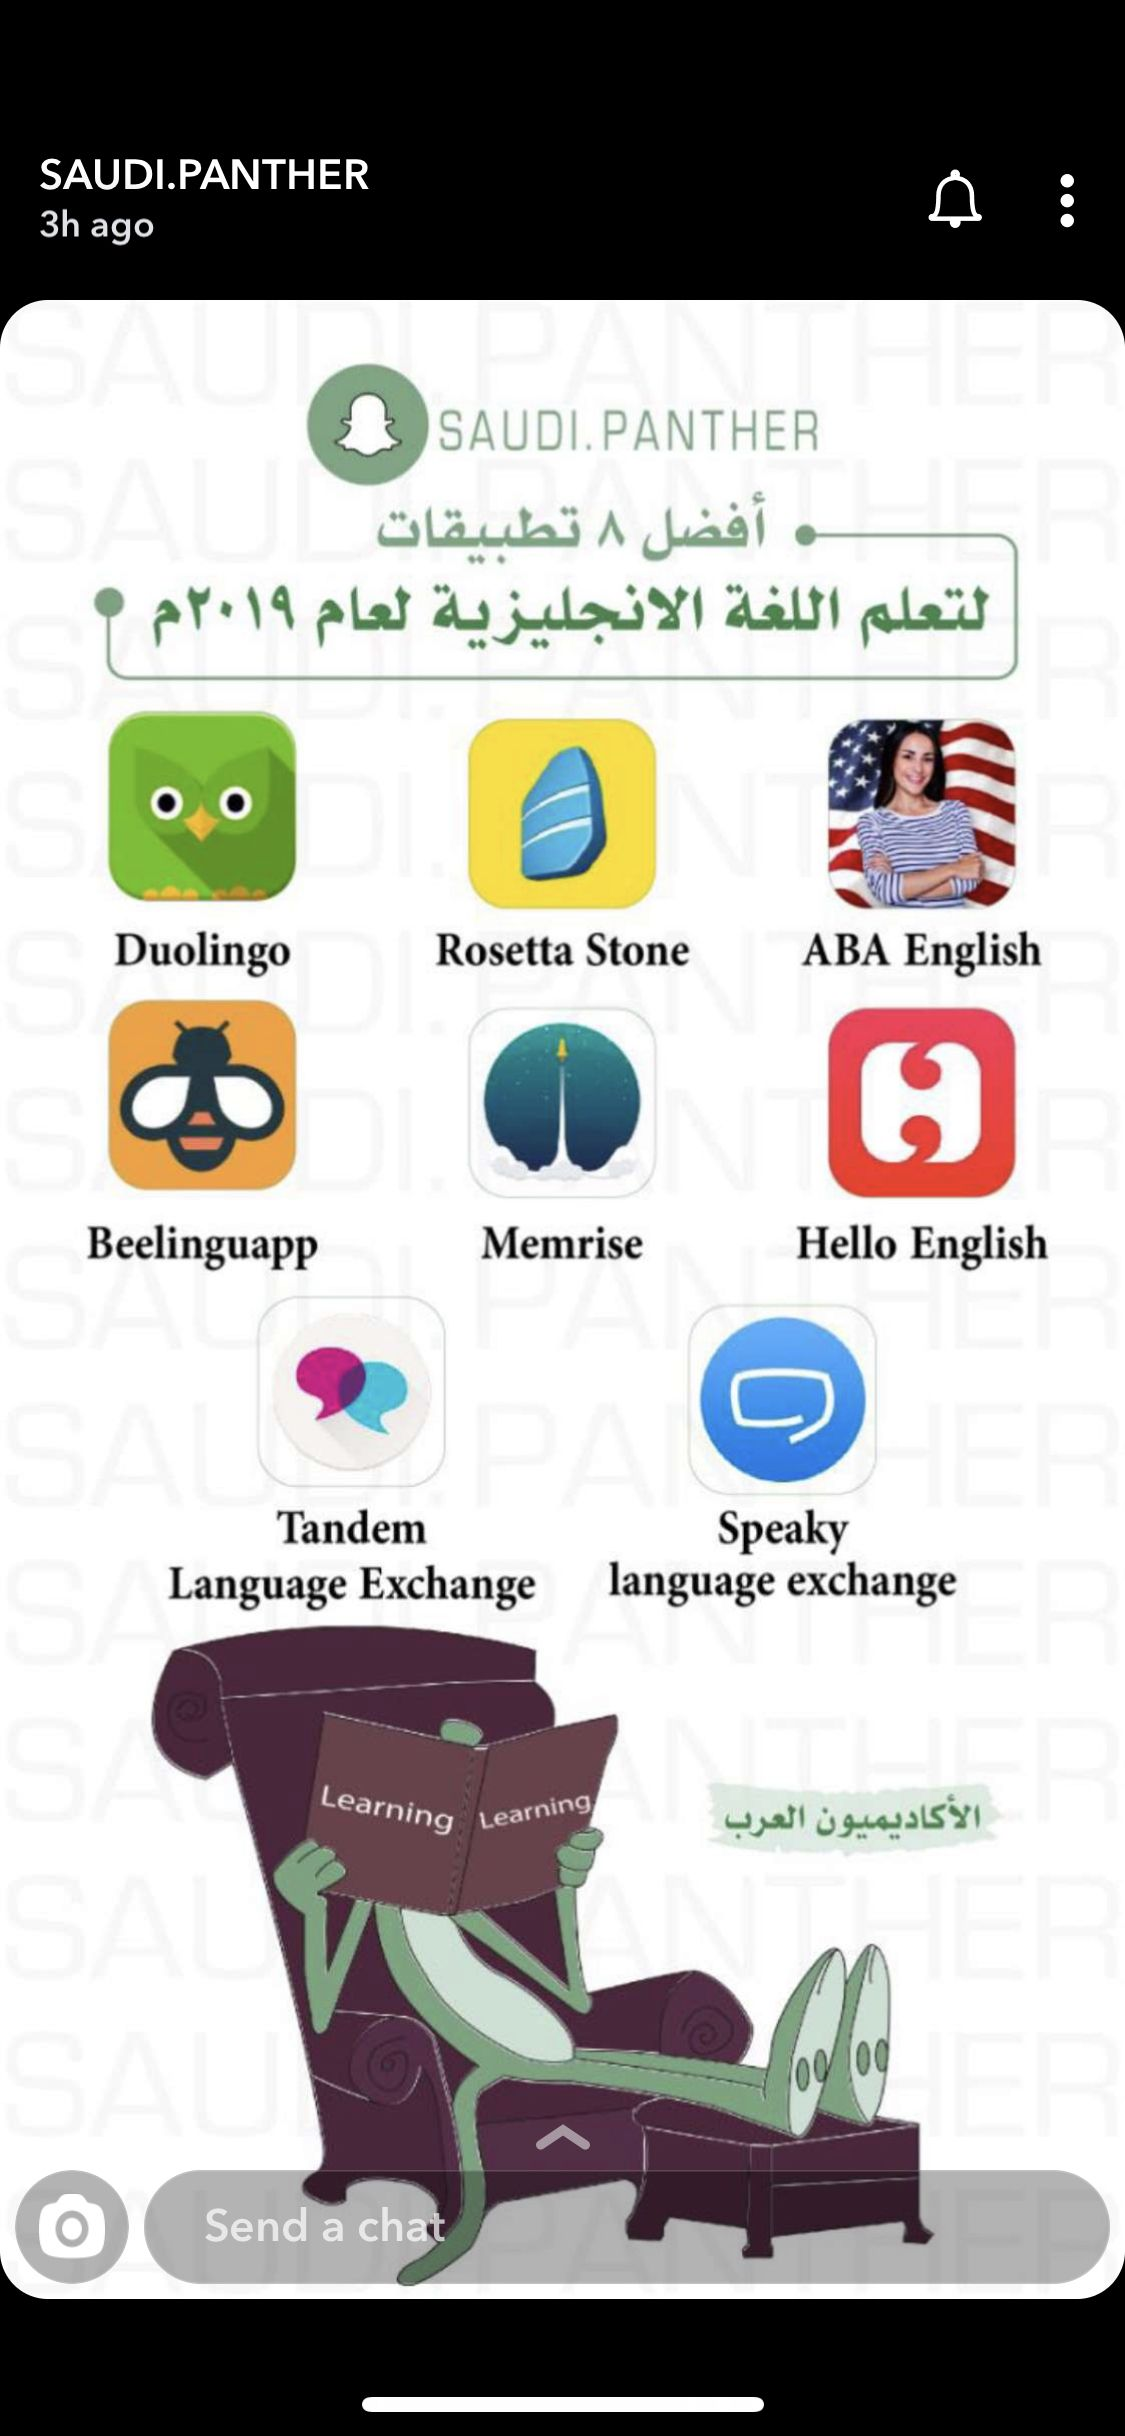 Pin by Bero Sh on Apps Hello english, Language exchange